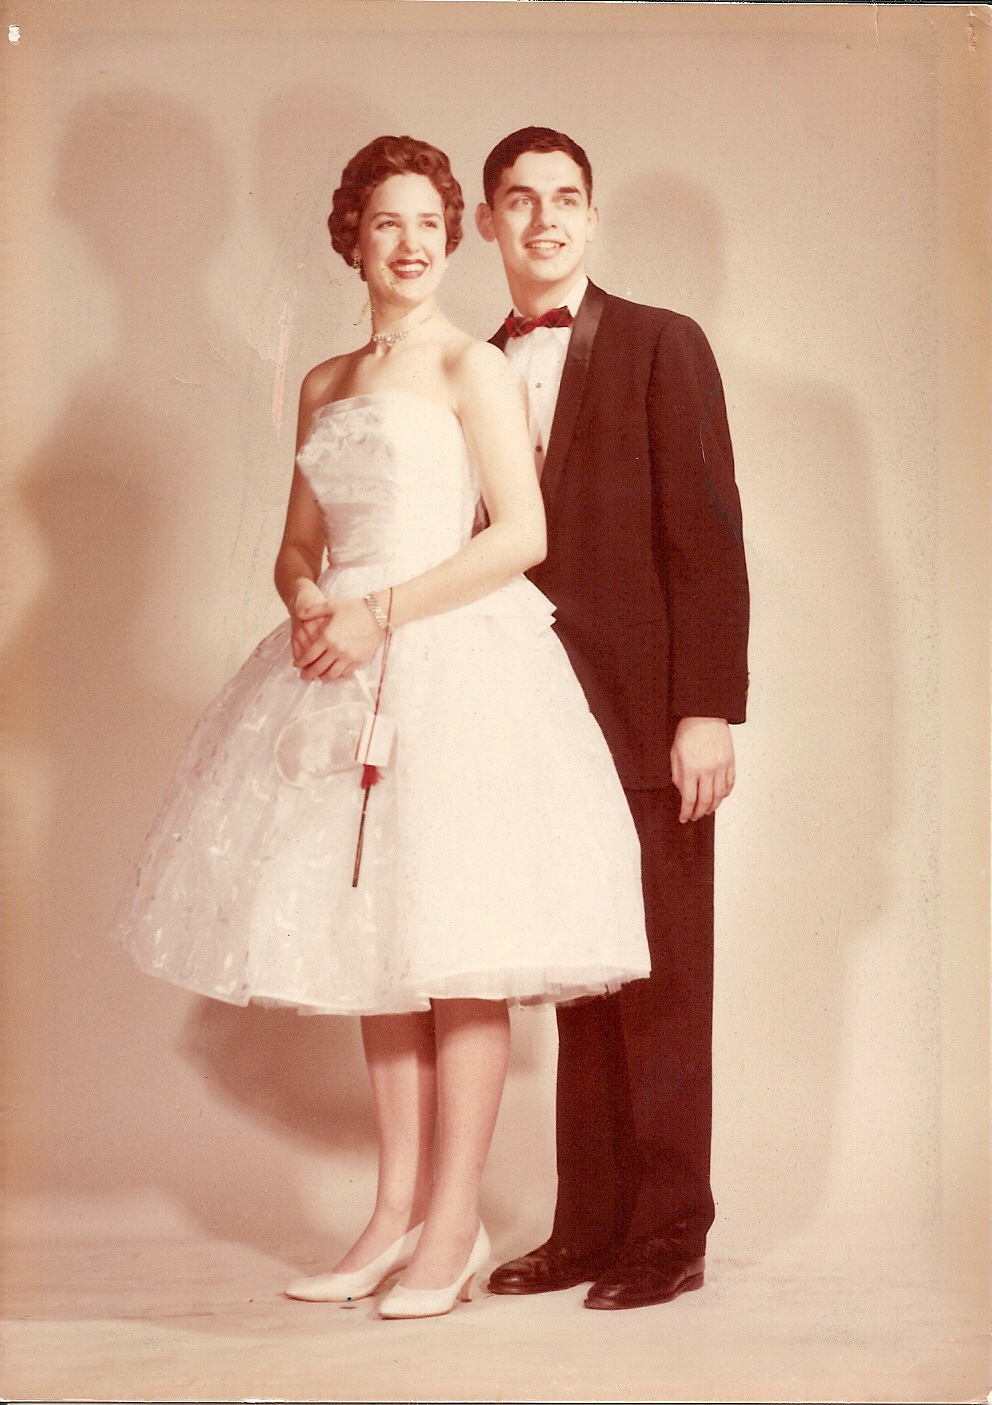 Carolaine with High School boyfriend before the big dance